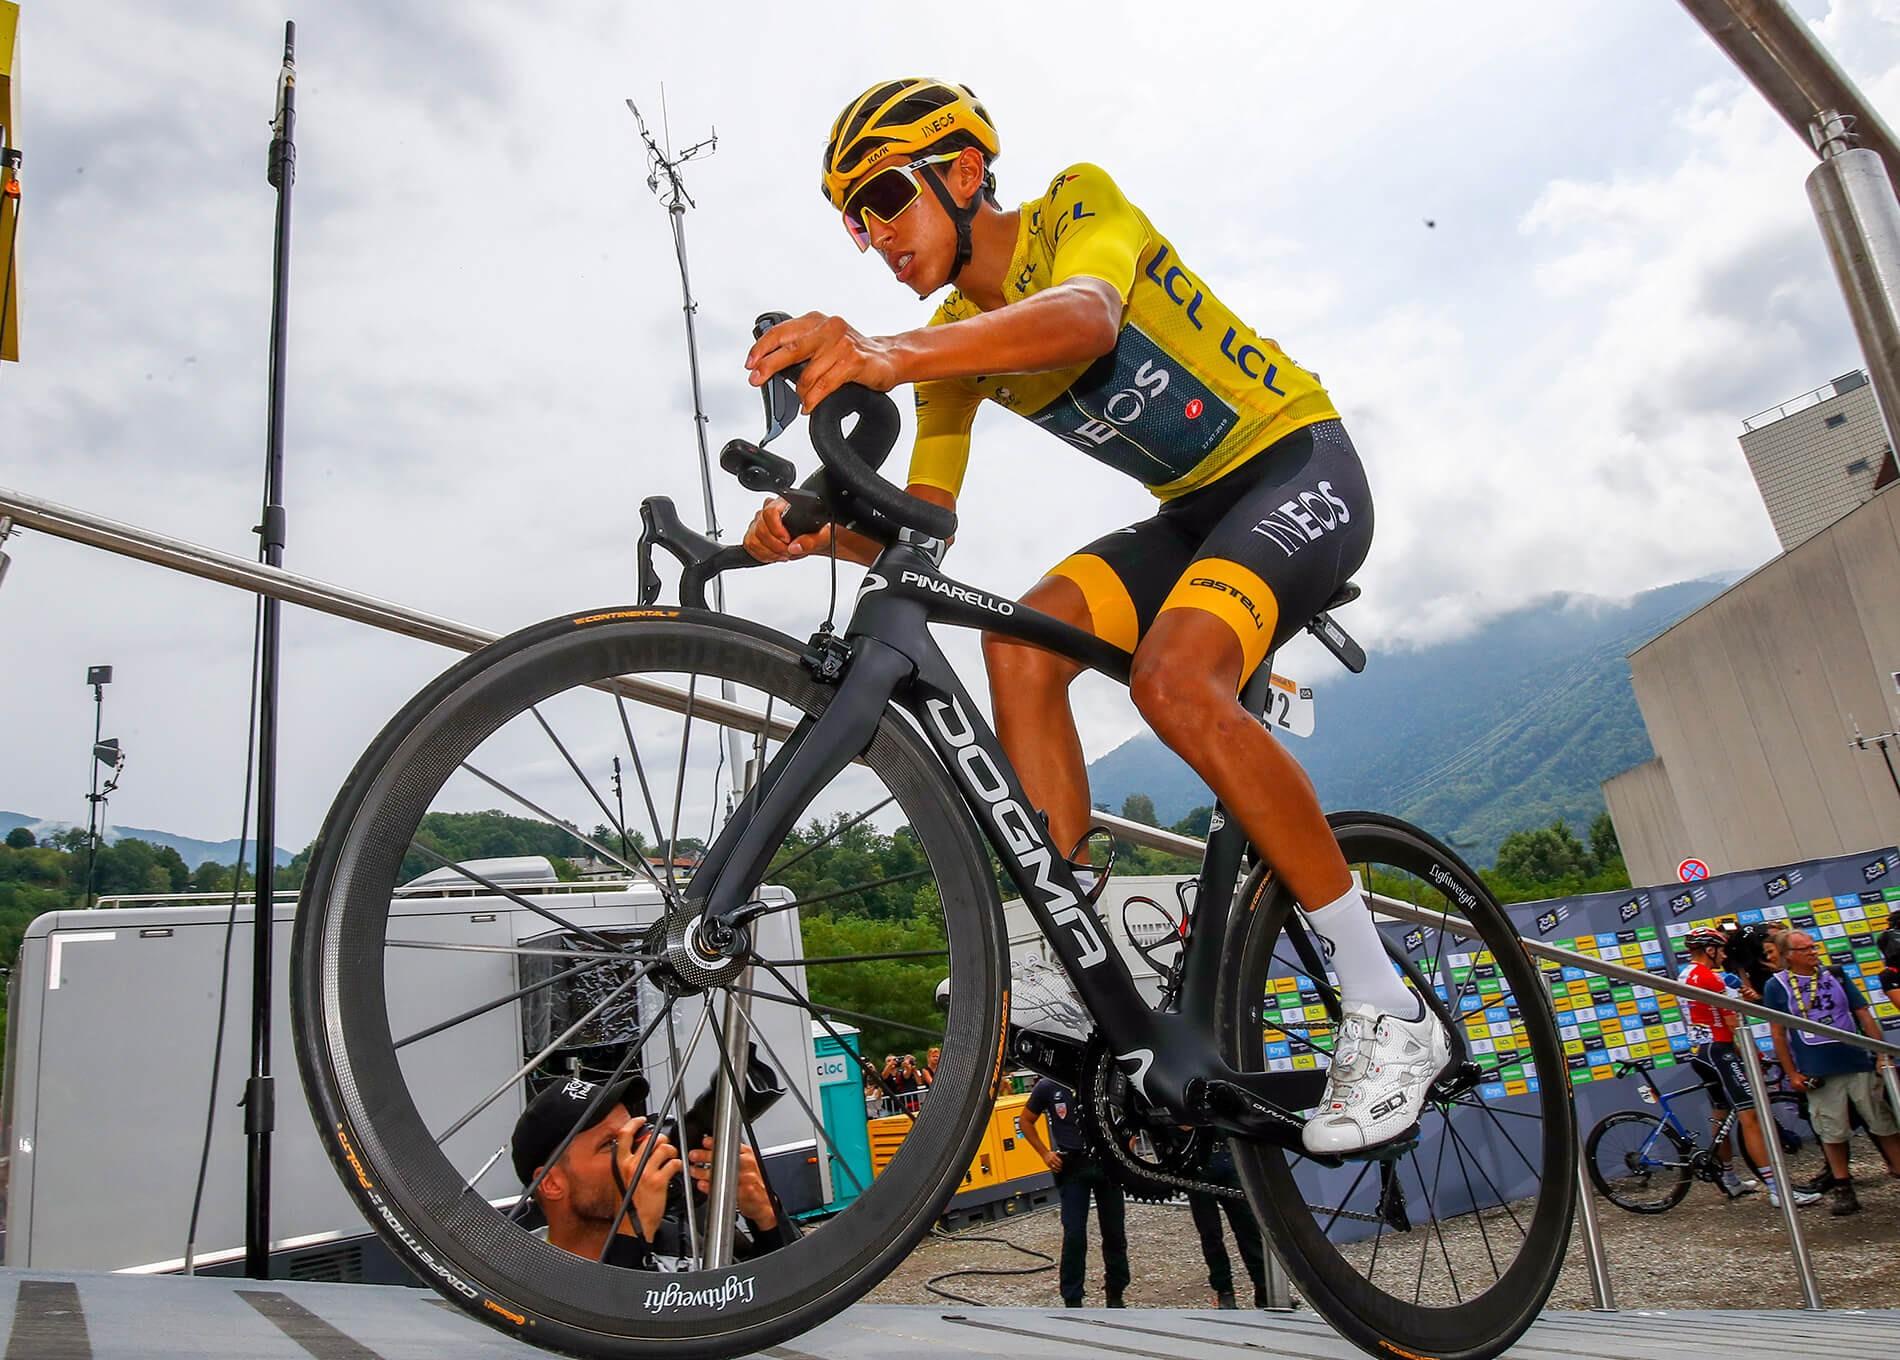 15 Tour de France Winners